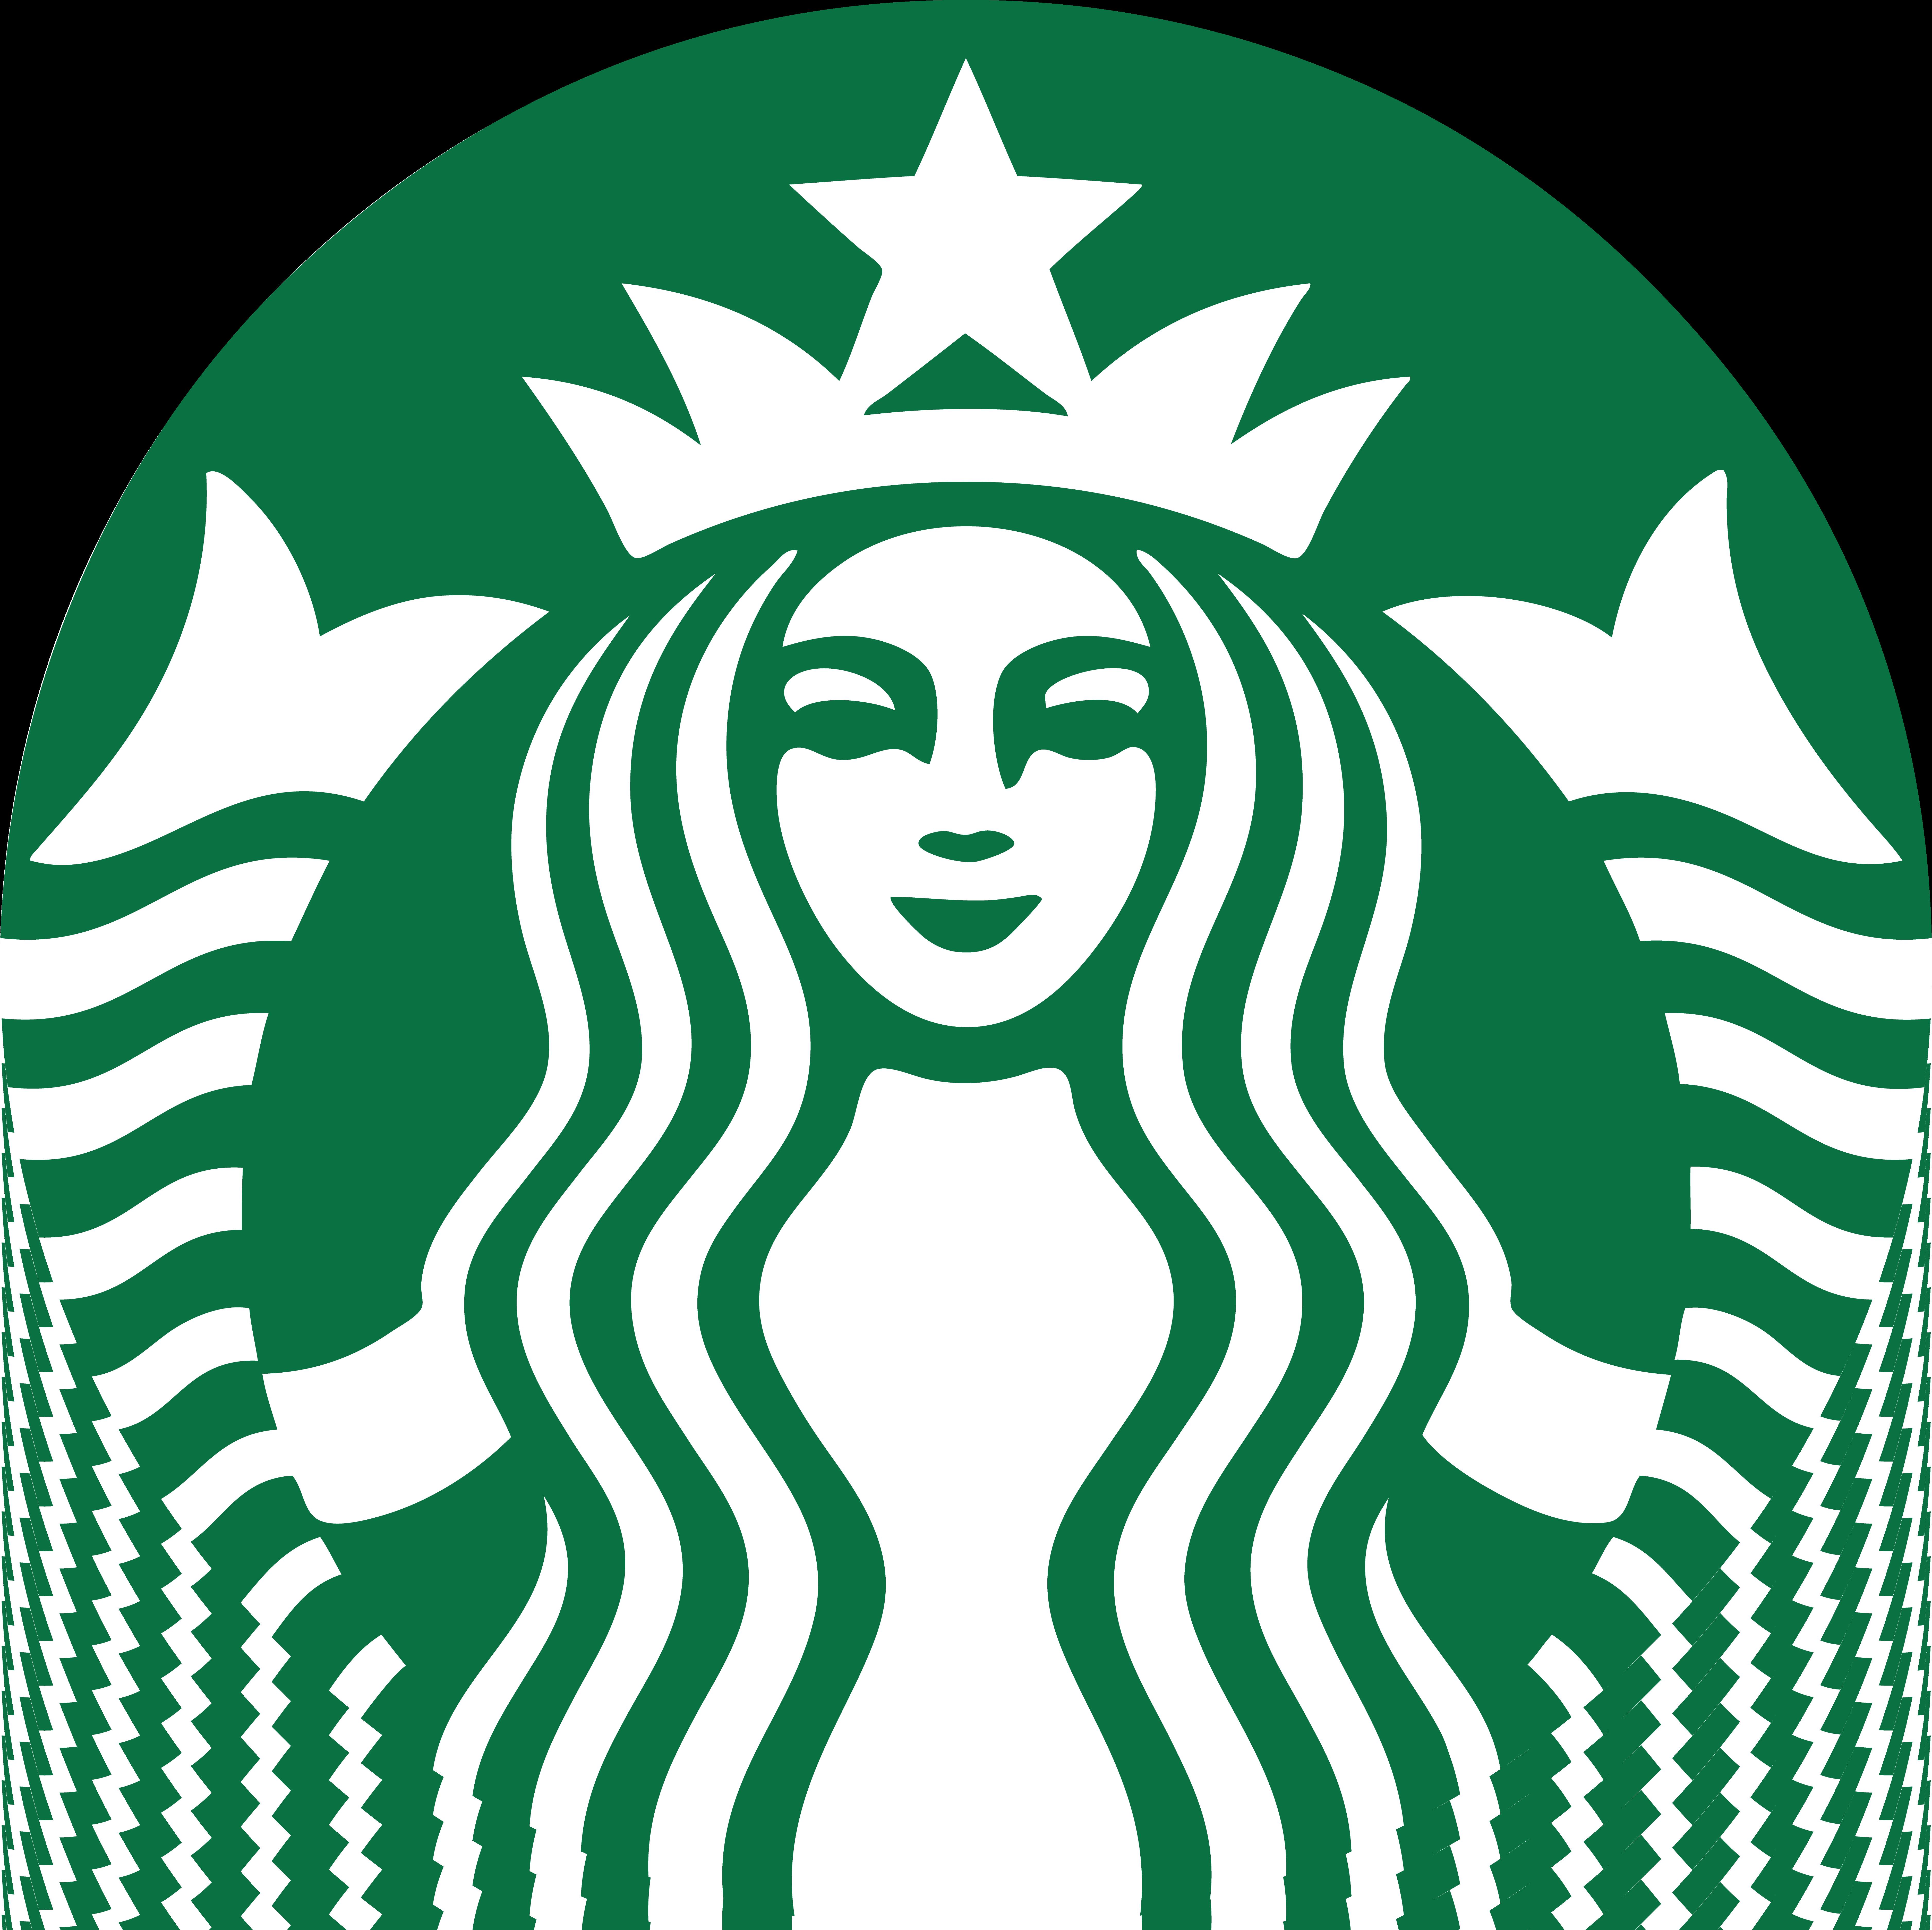 Images of Starbucks | 7502x7493